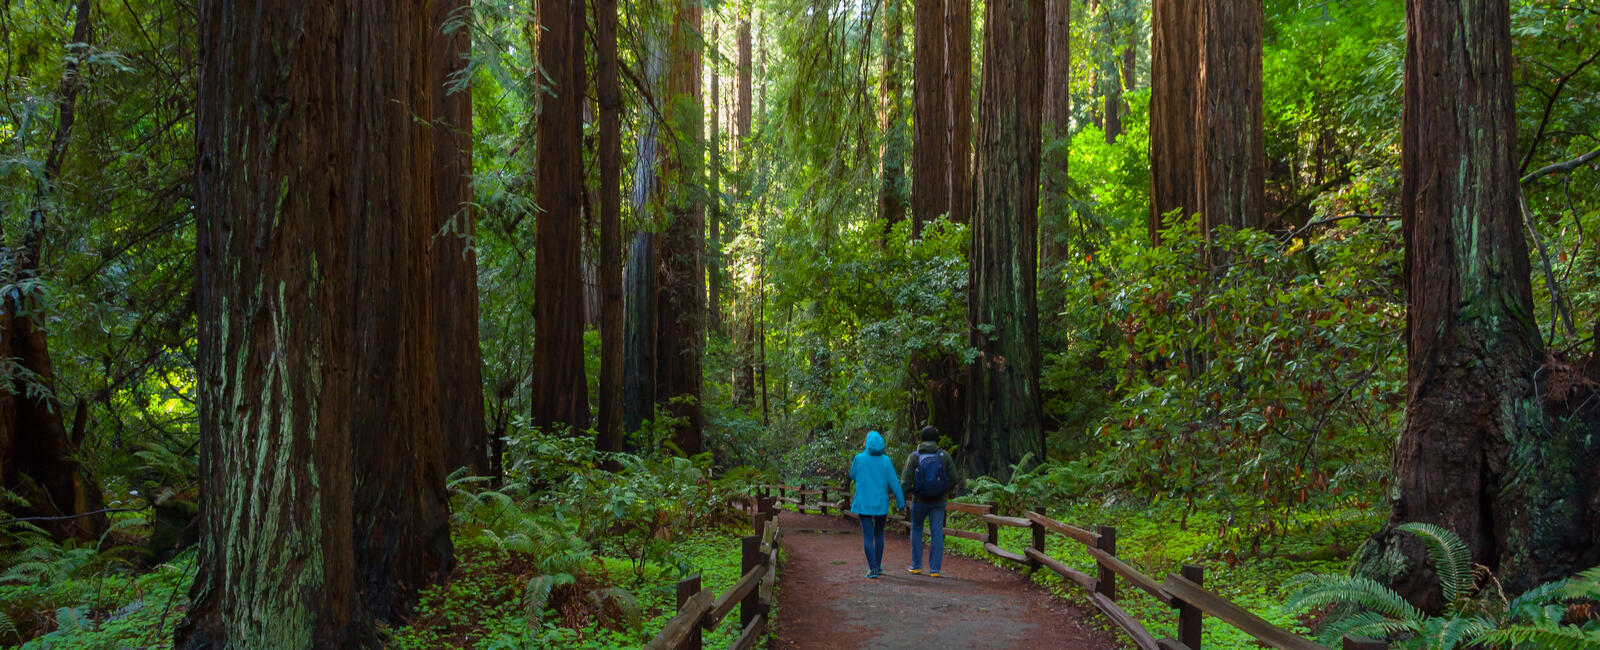 Two people walking among large redwood trees in Muir Woods.